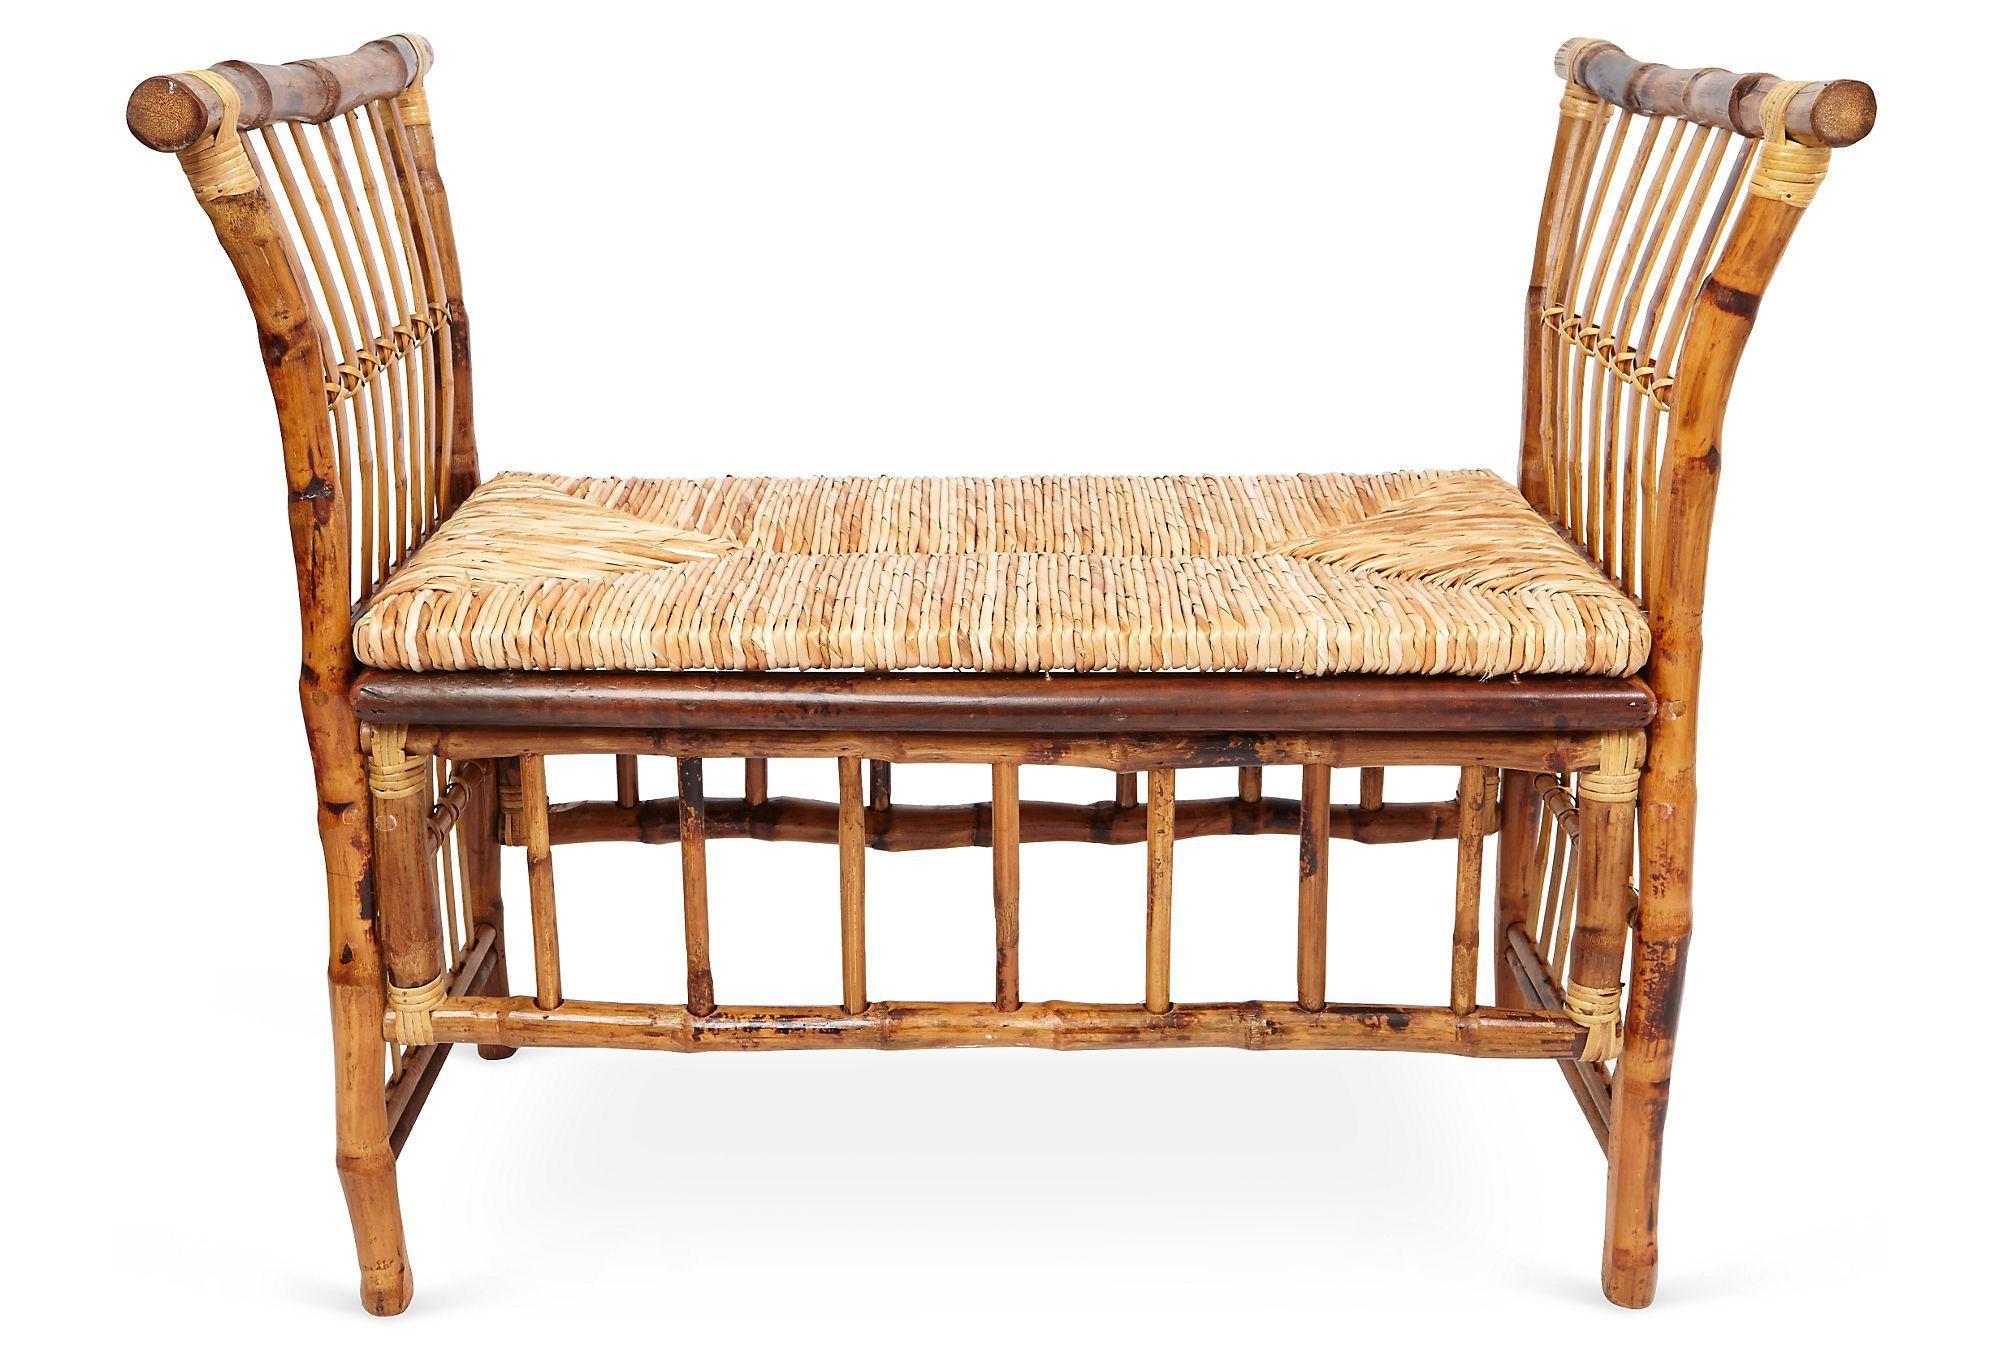 Craigslist Dc Outdoor Furniture